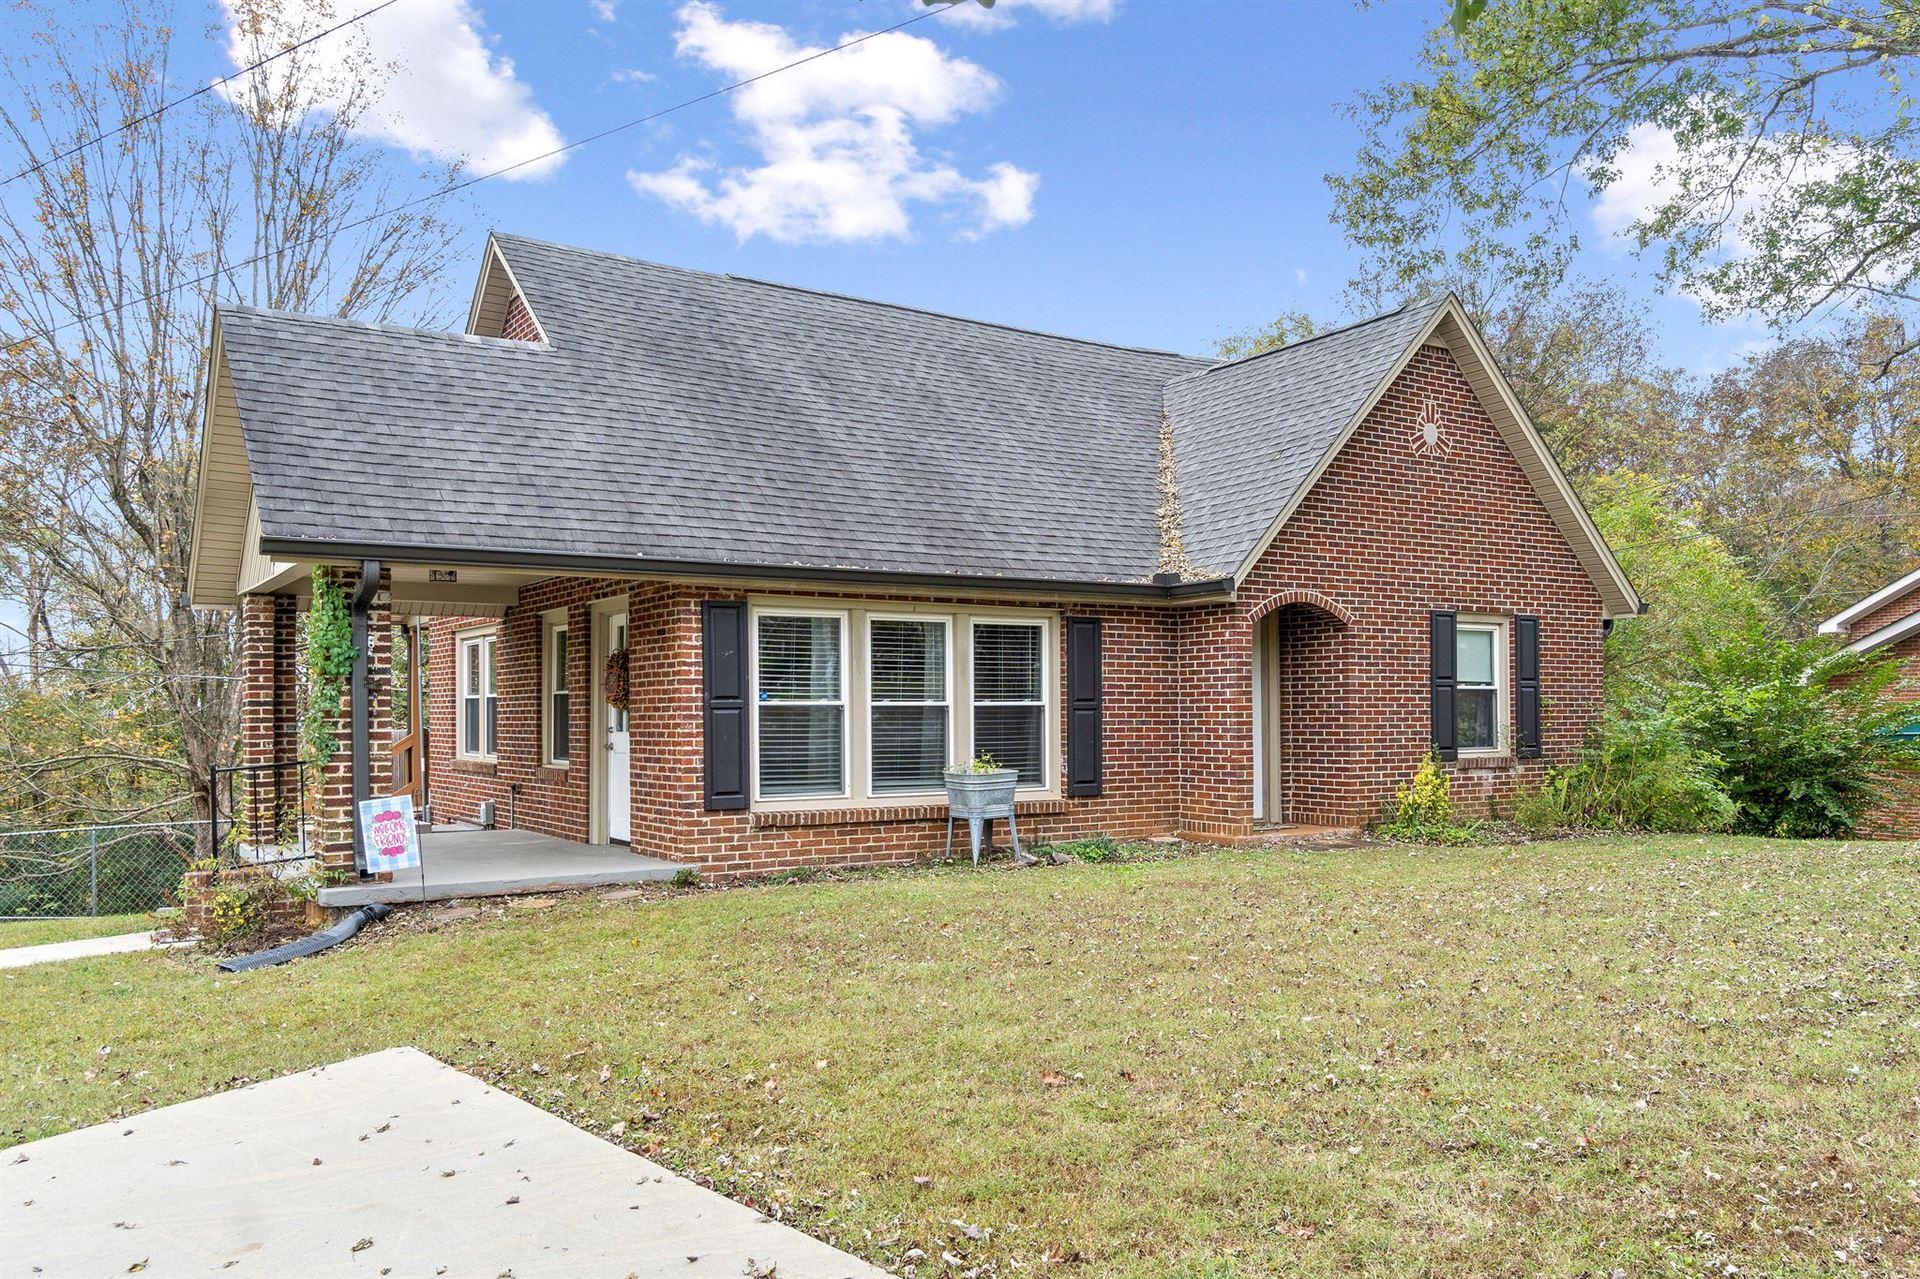 2374 Old Ashland City Rd, Clarksville, TN 37043 - MLS#: 2202393